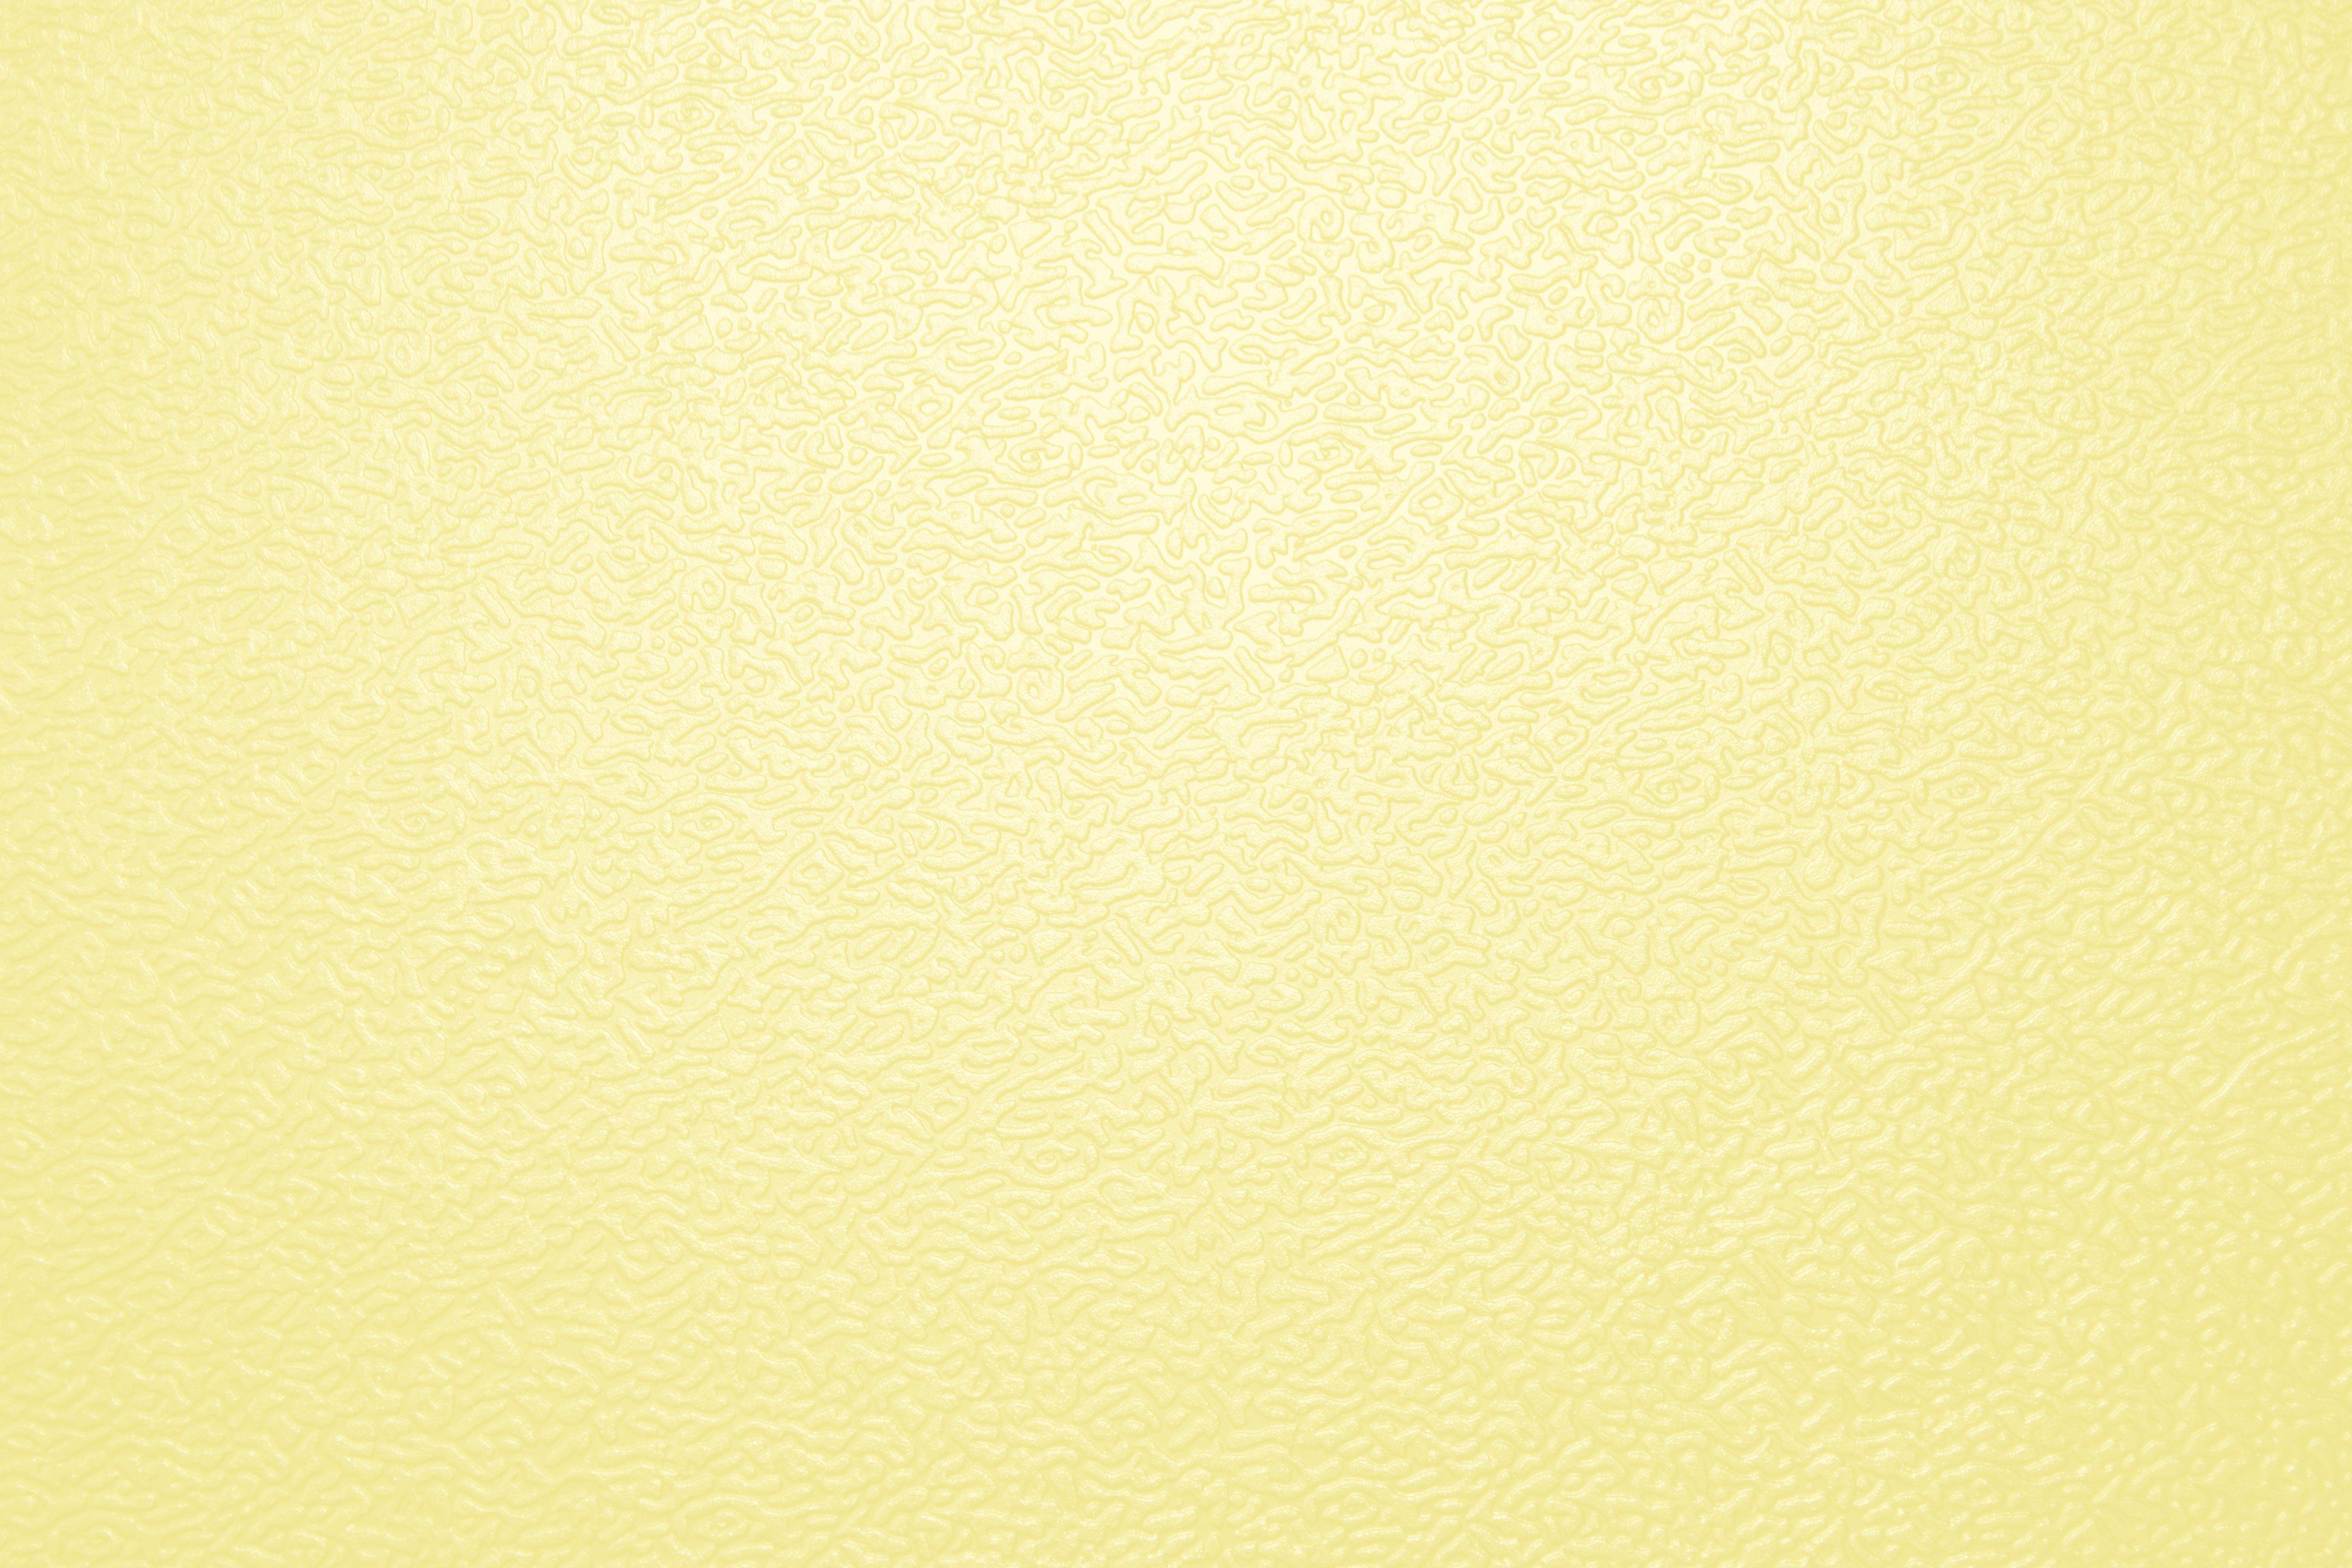 light yellow wallpaper wallpapersafari. Black Bedroom Furniture Sets. Home Design Ideas